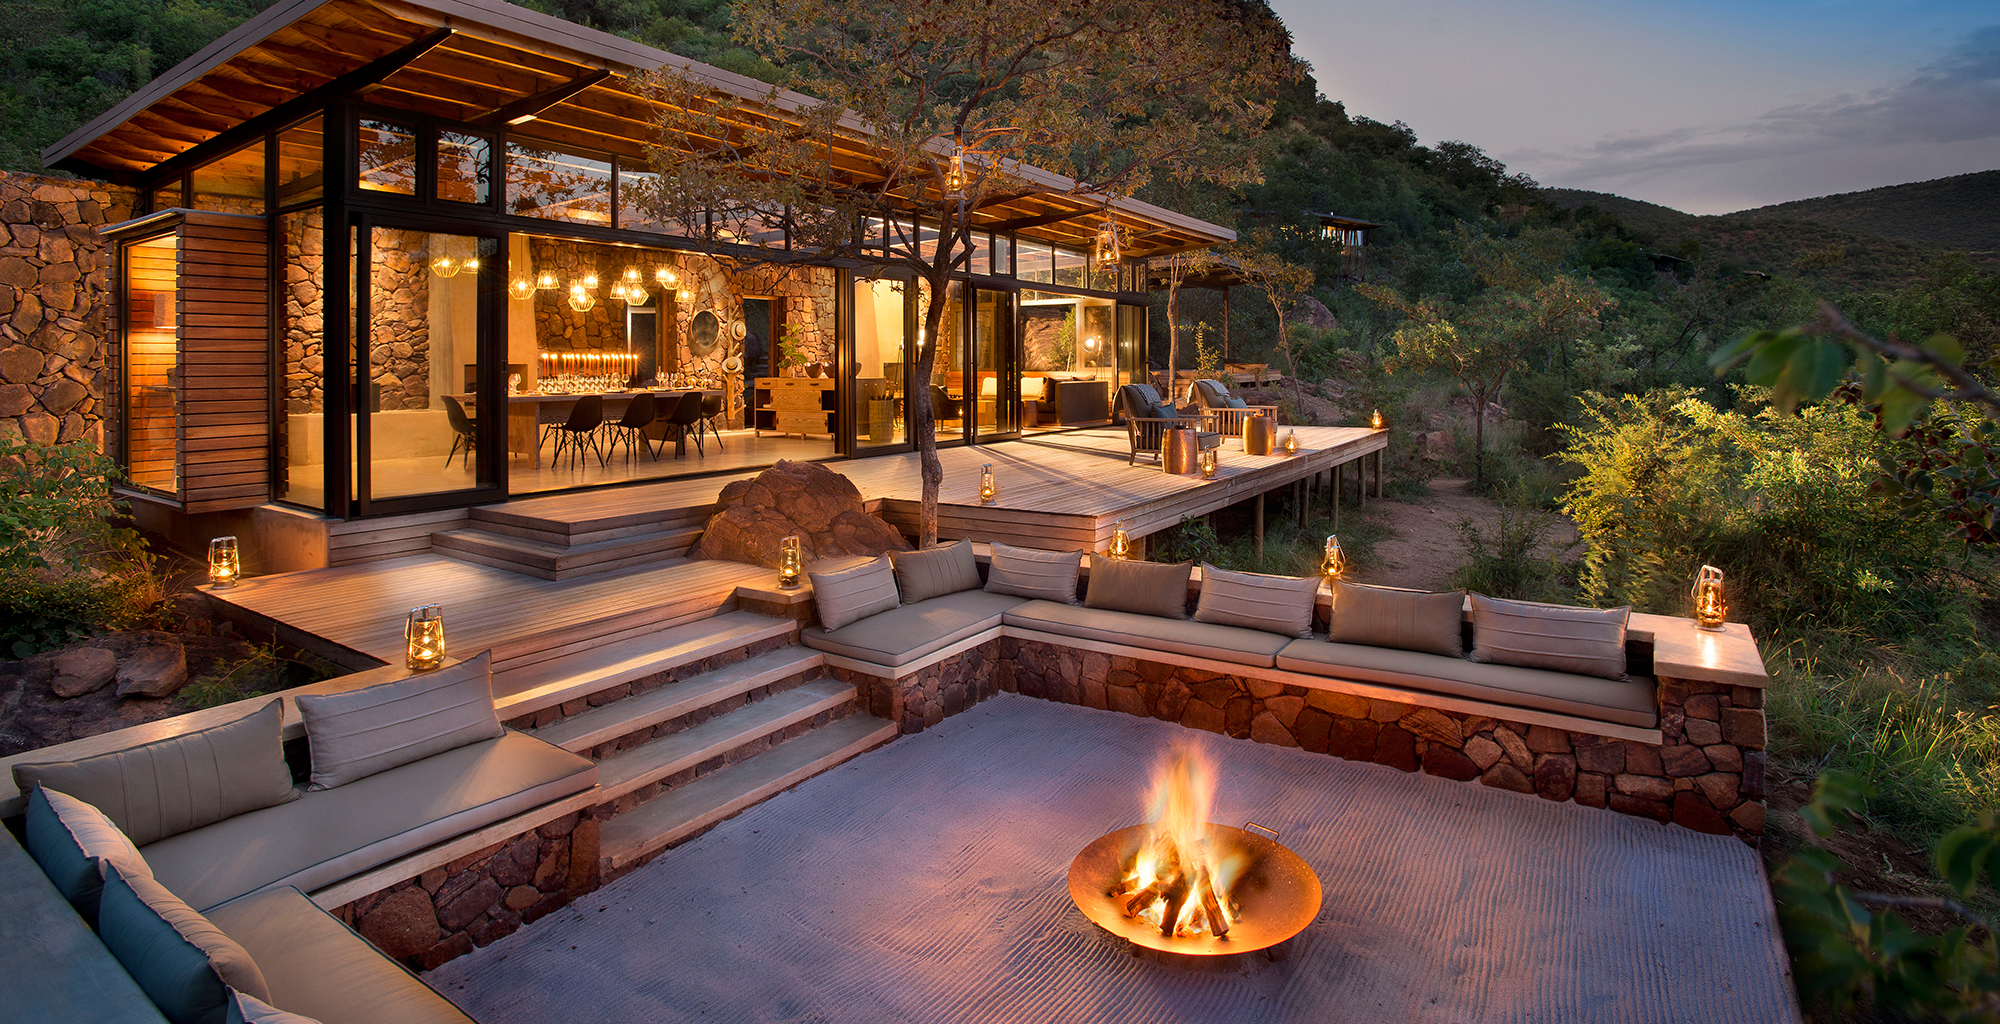 South-Africa-Marataba-Mountain-Lodge-Exterior-Fire